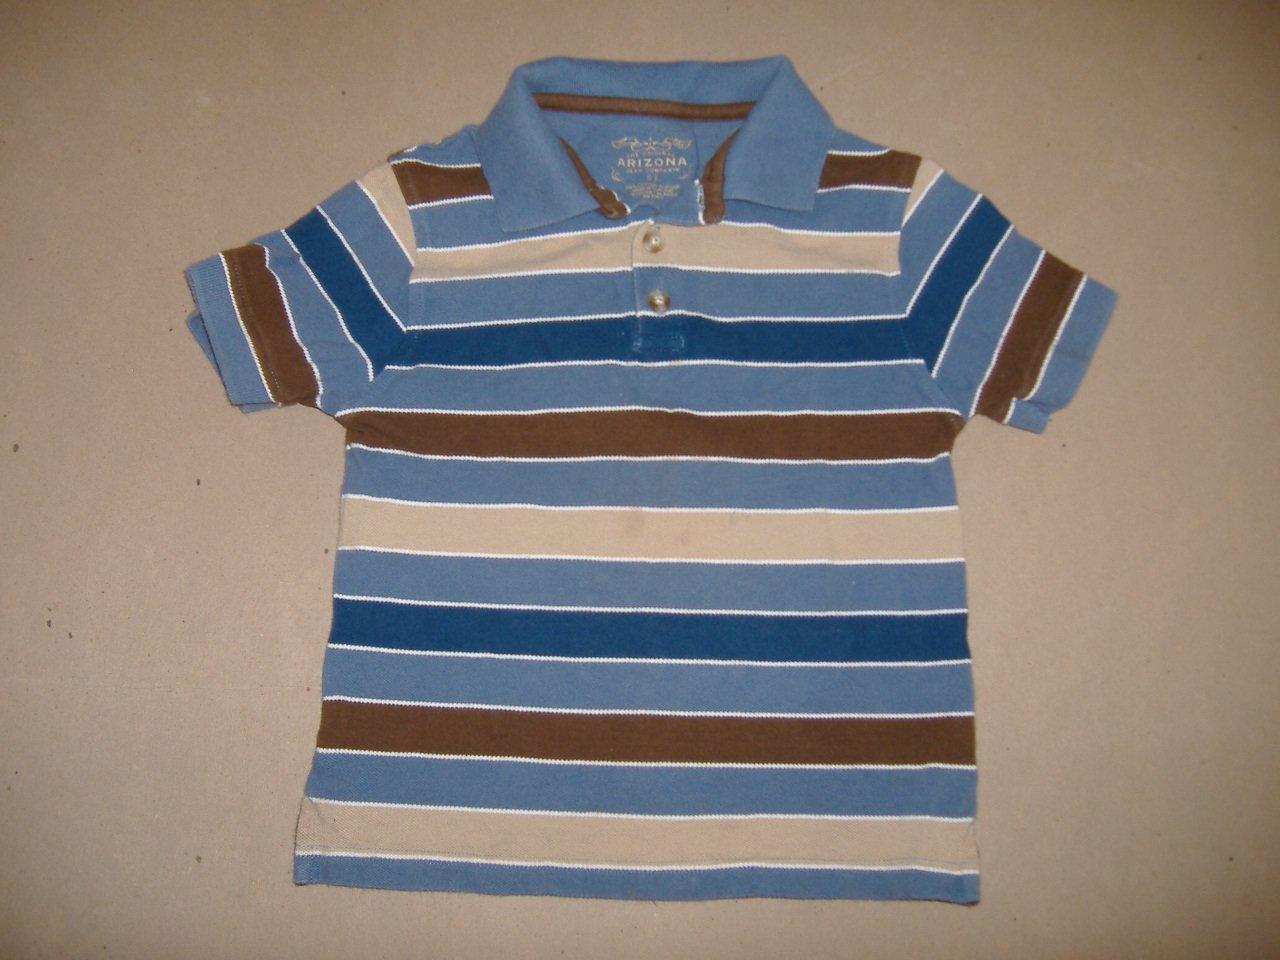 Boys Arizona Pull -On Shirt      Size 5